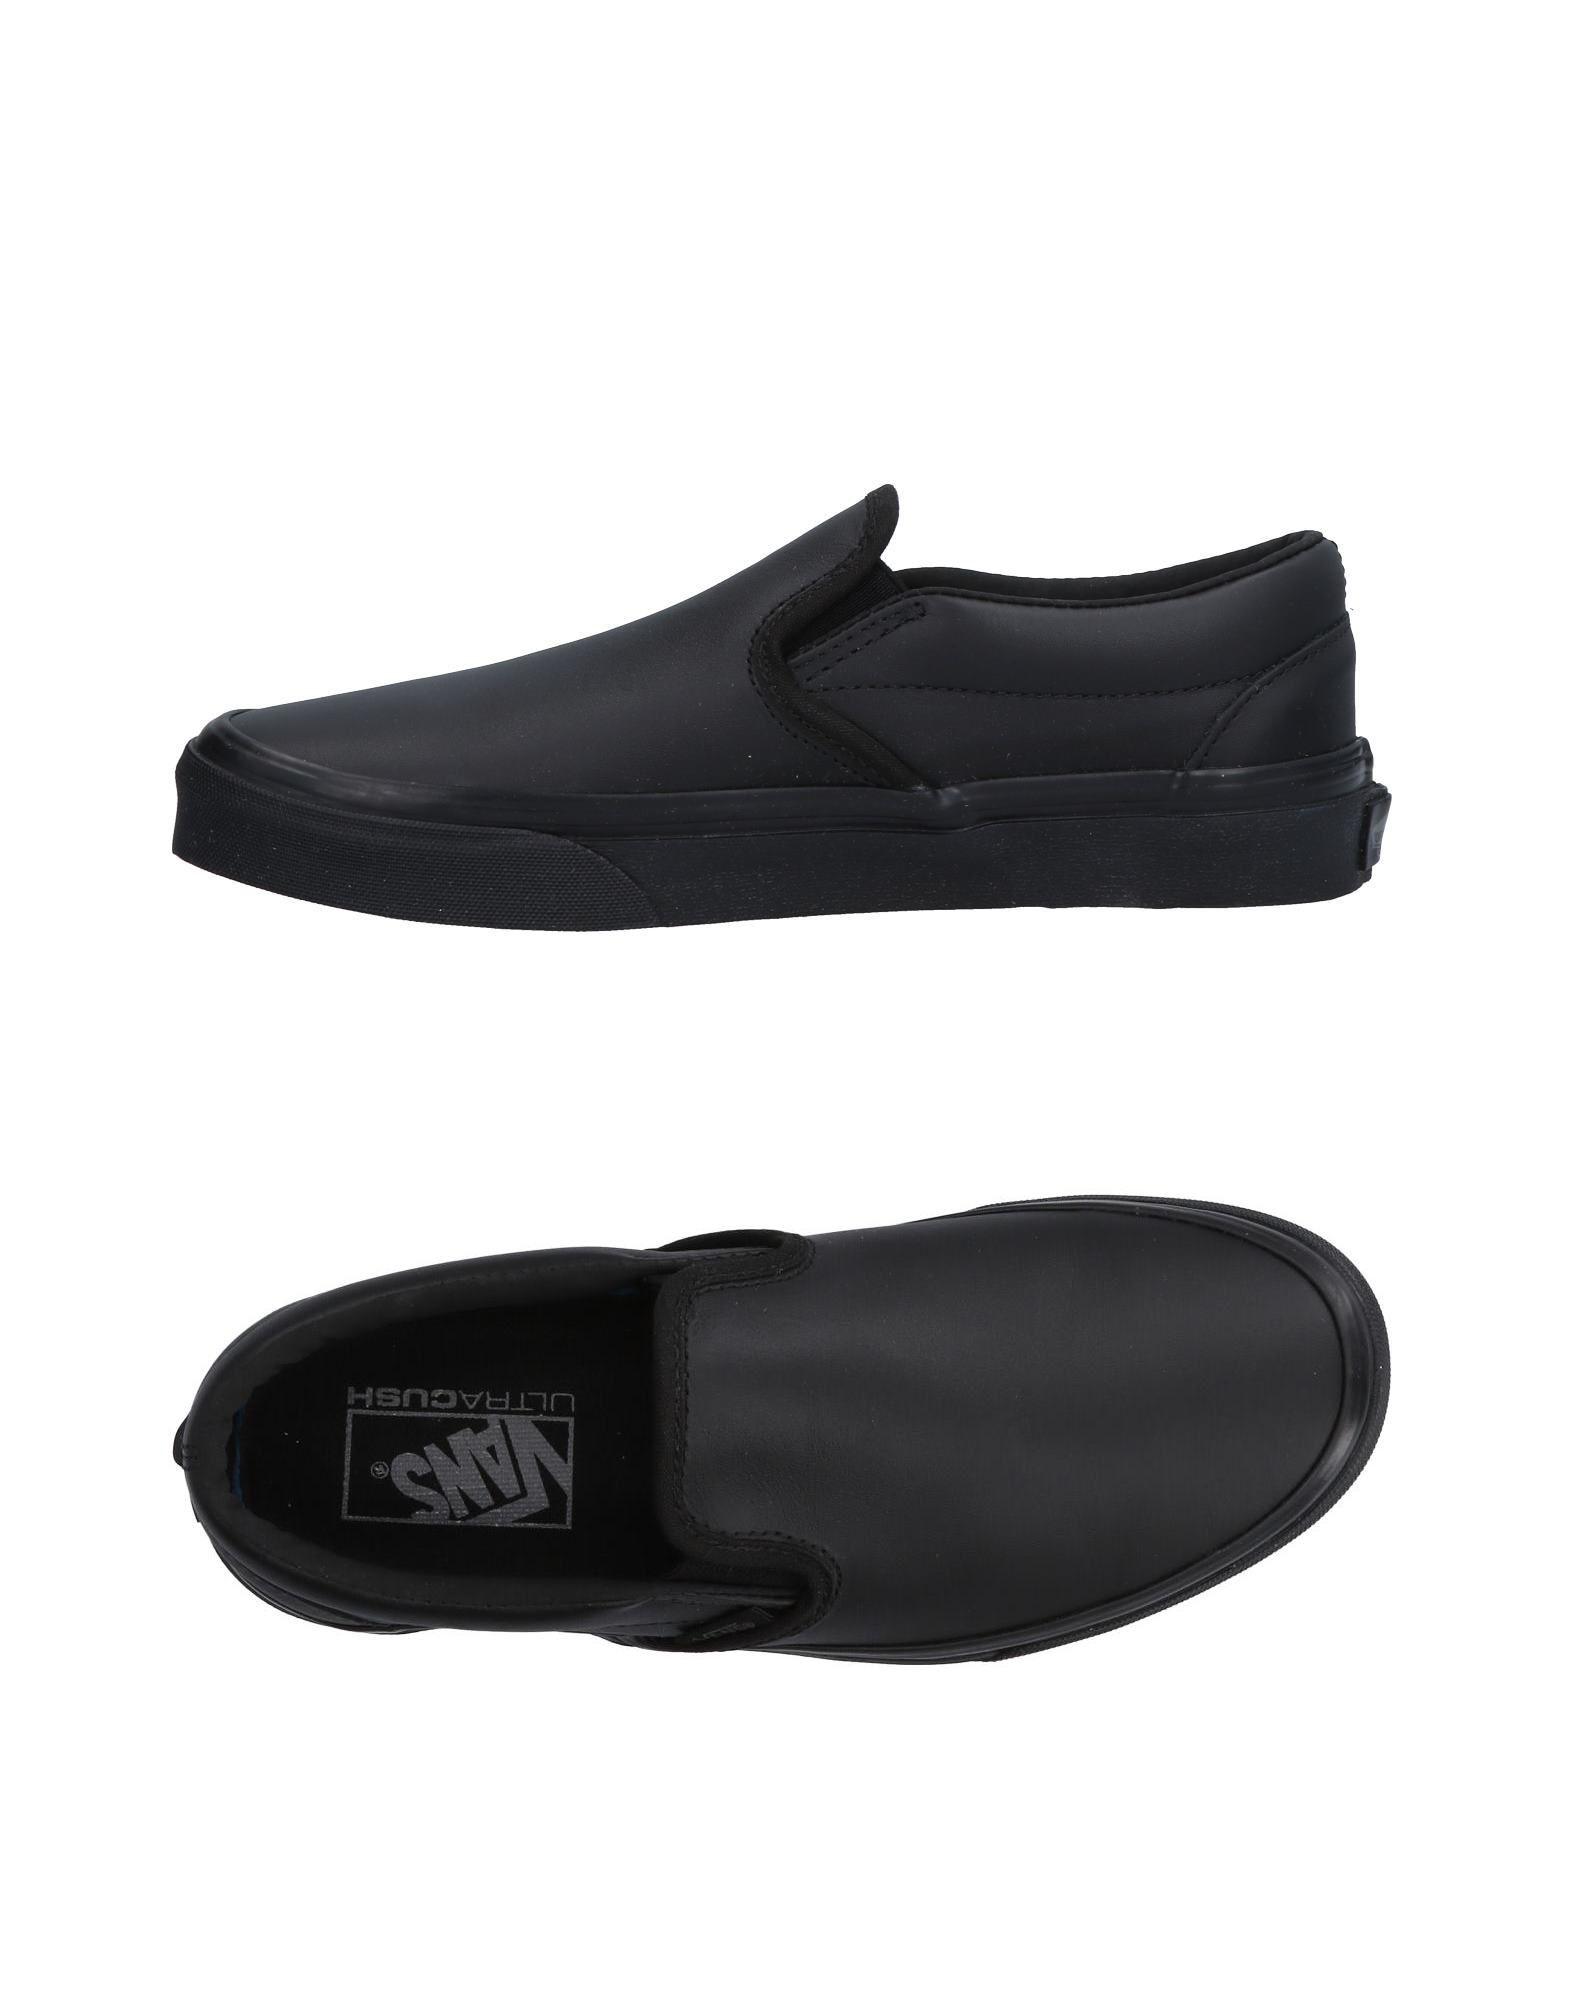 Vans Sneakers Damen  11495653XC Gute Qualität beliebte Schuhe